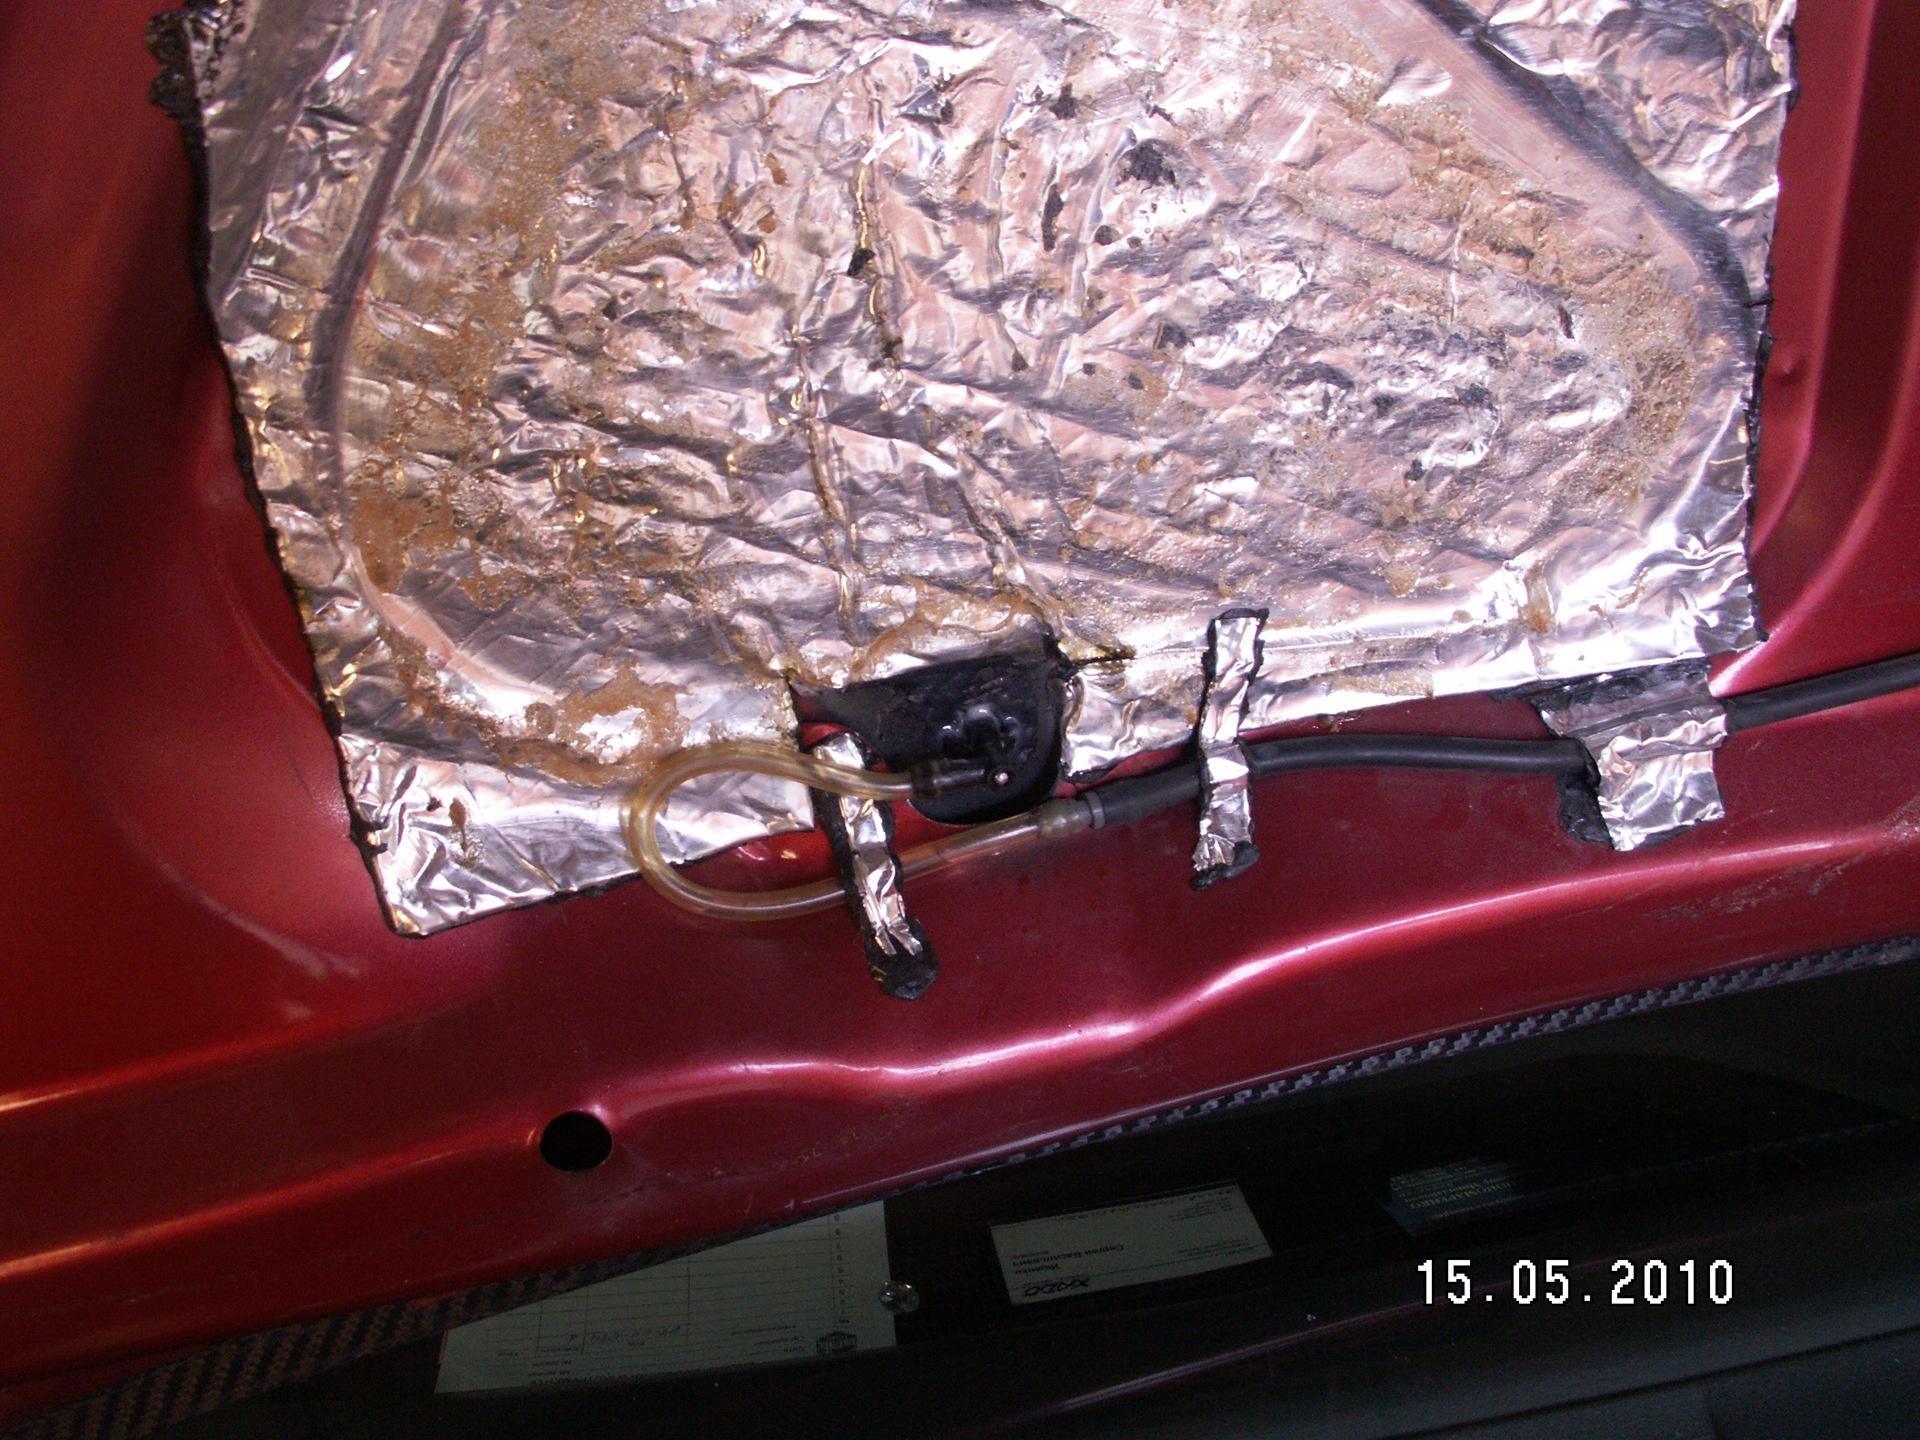 Замена кабеля аккумуляторной батареи ситроен с5